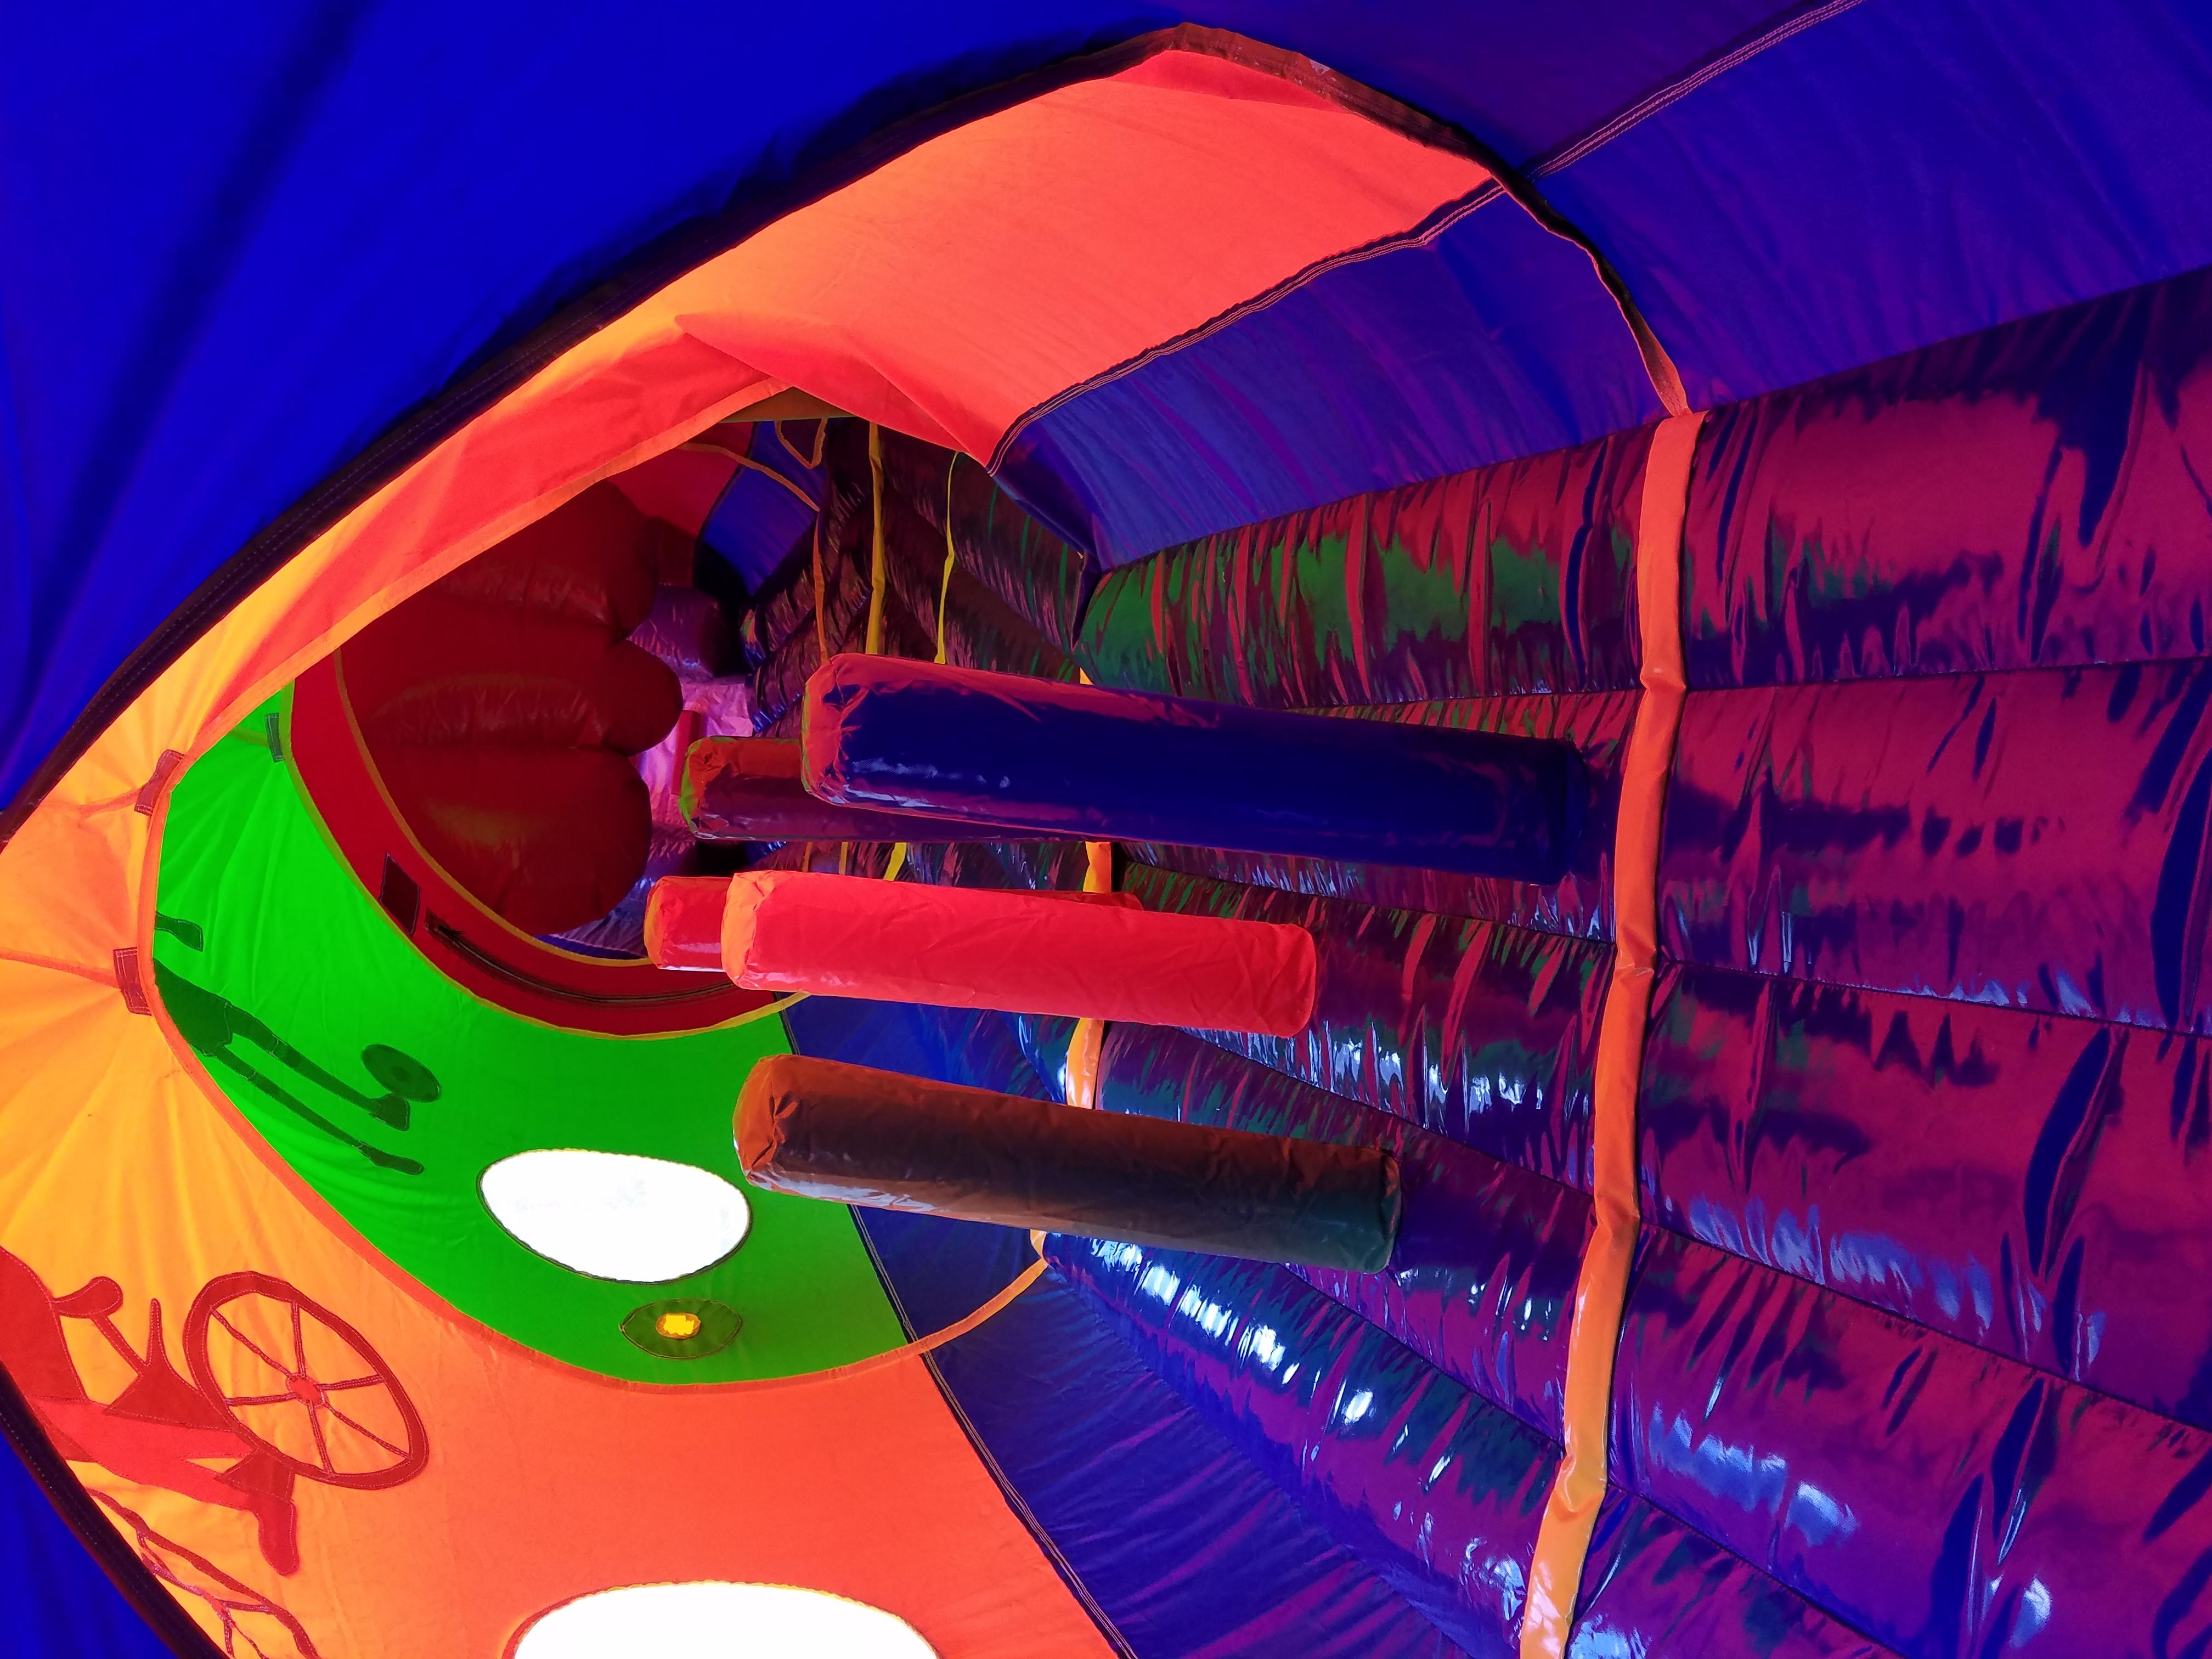 Kool Kat Inside view